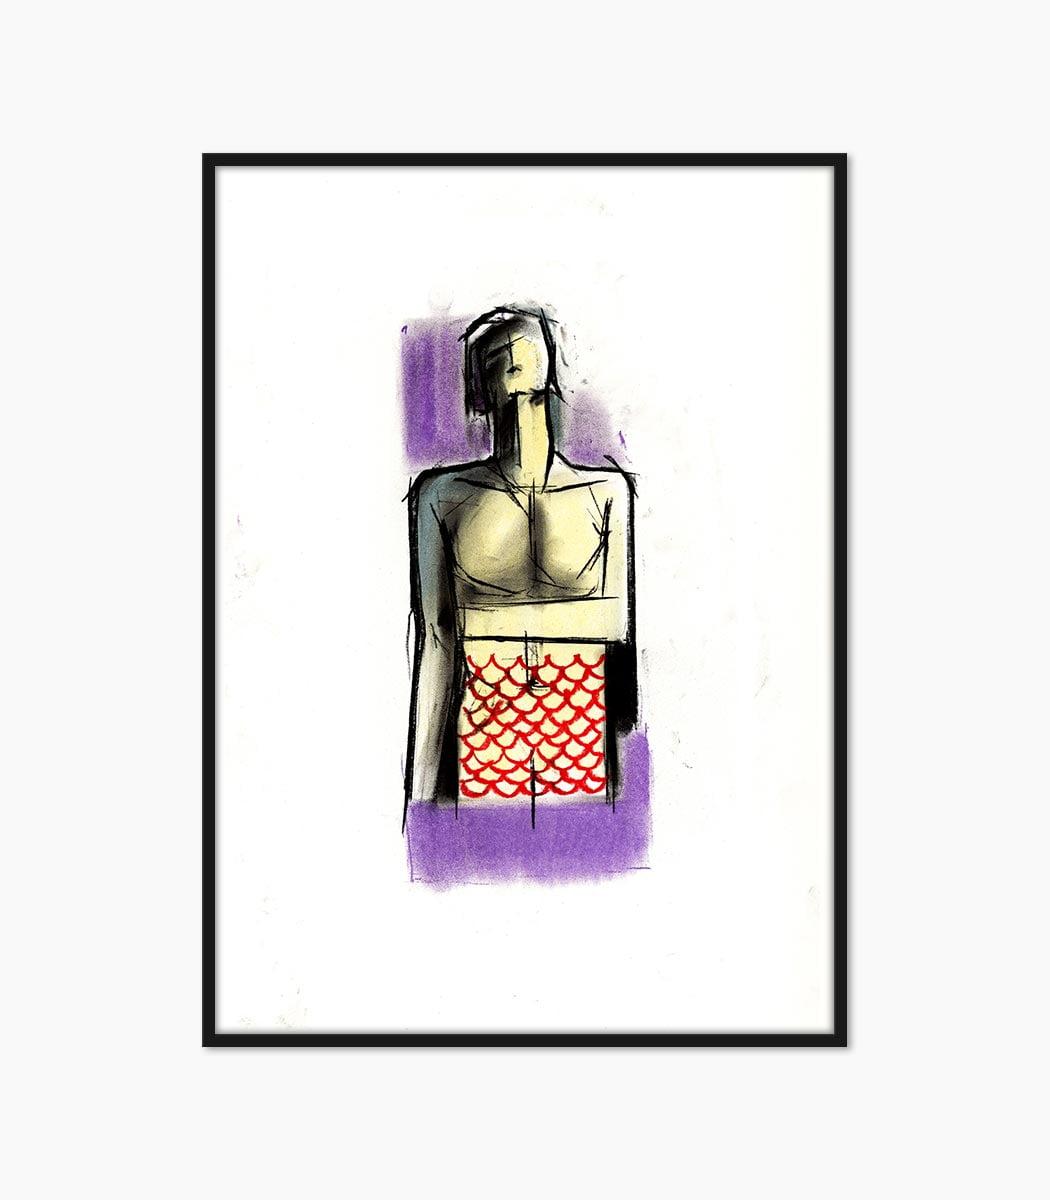 print culoare creta creat manual si printat la calitate superioara numai pe www.artwall.ro